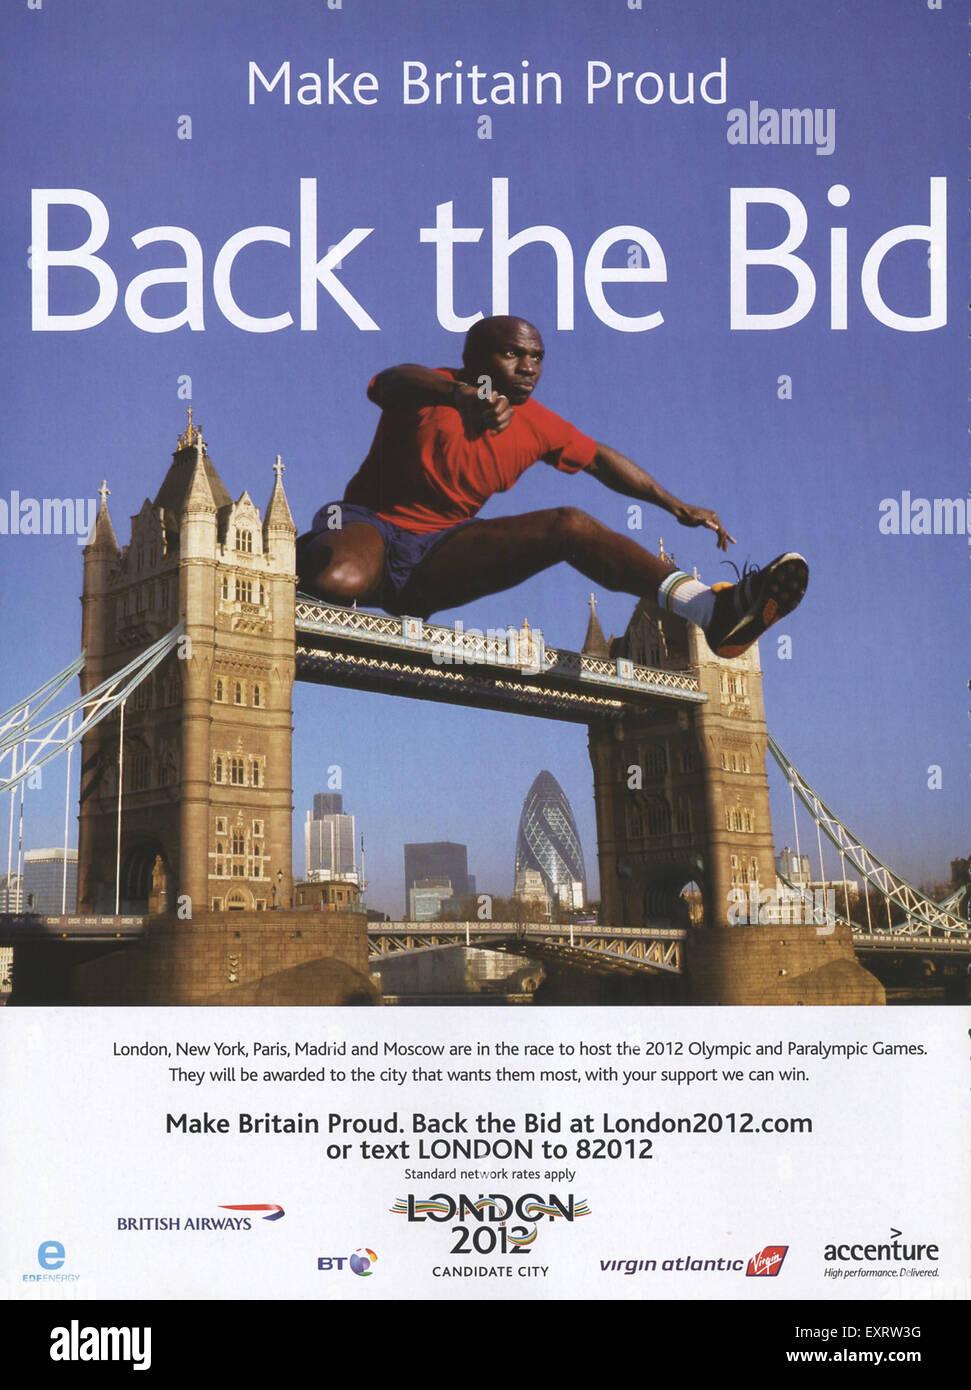 2000s UK Back the bid London 2012 Magazine Advert - Stock Image